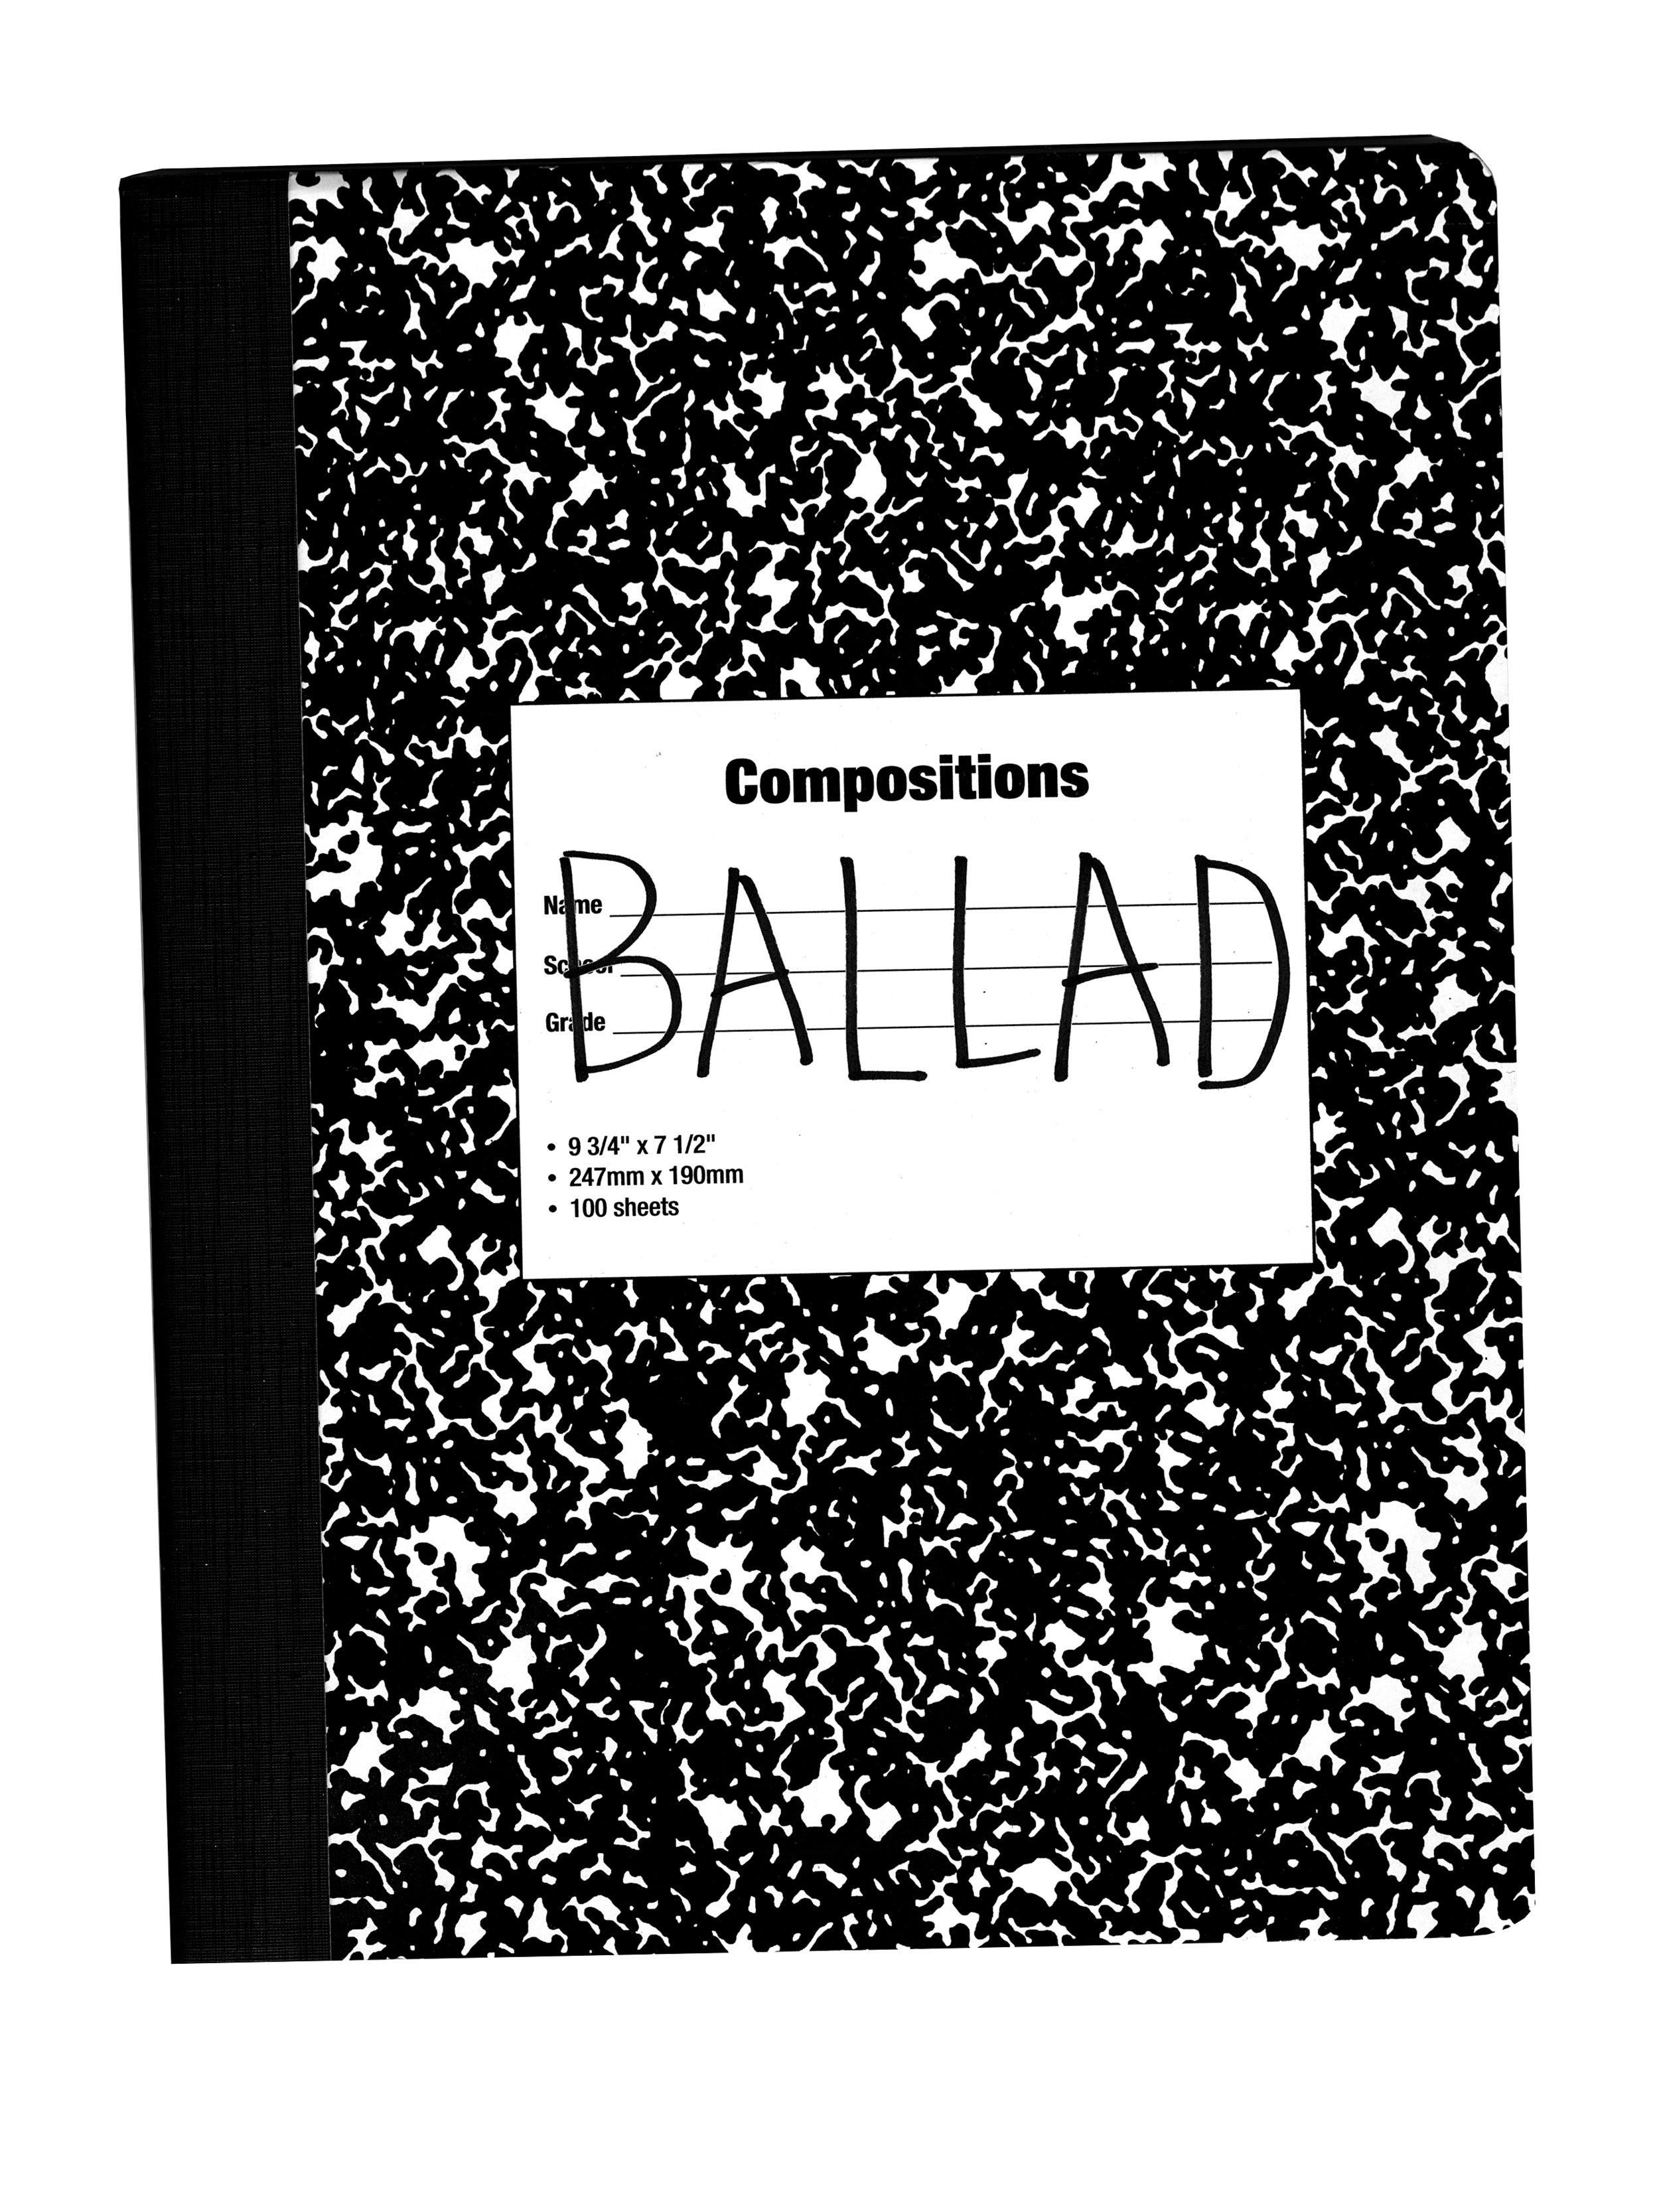 Ballad - 2006